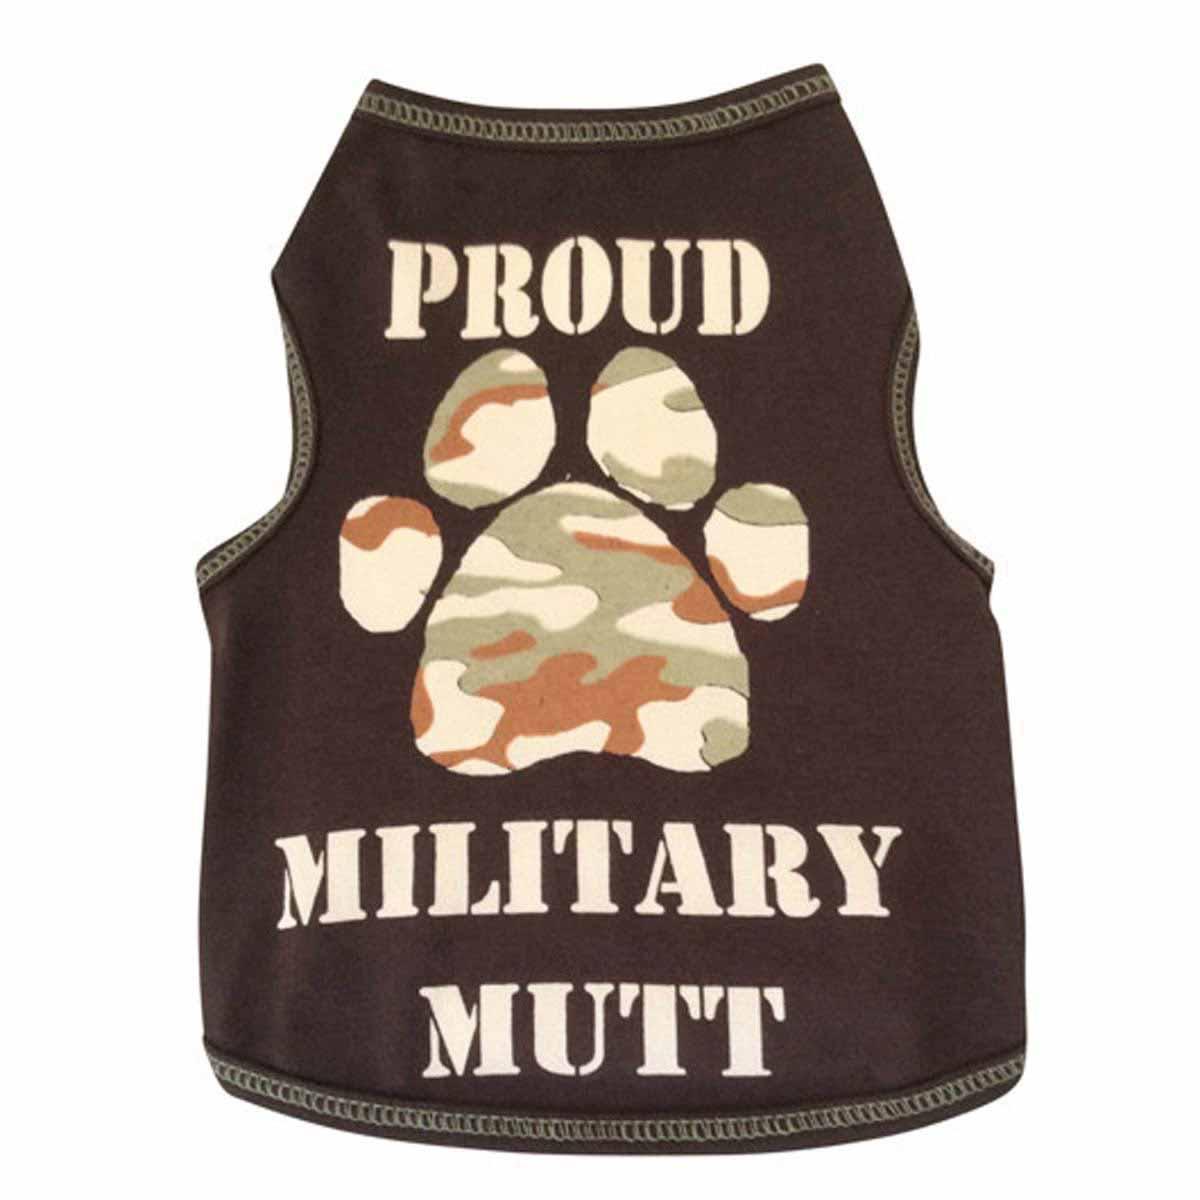 Proud Military Mutt Dog Tank